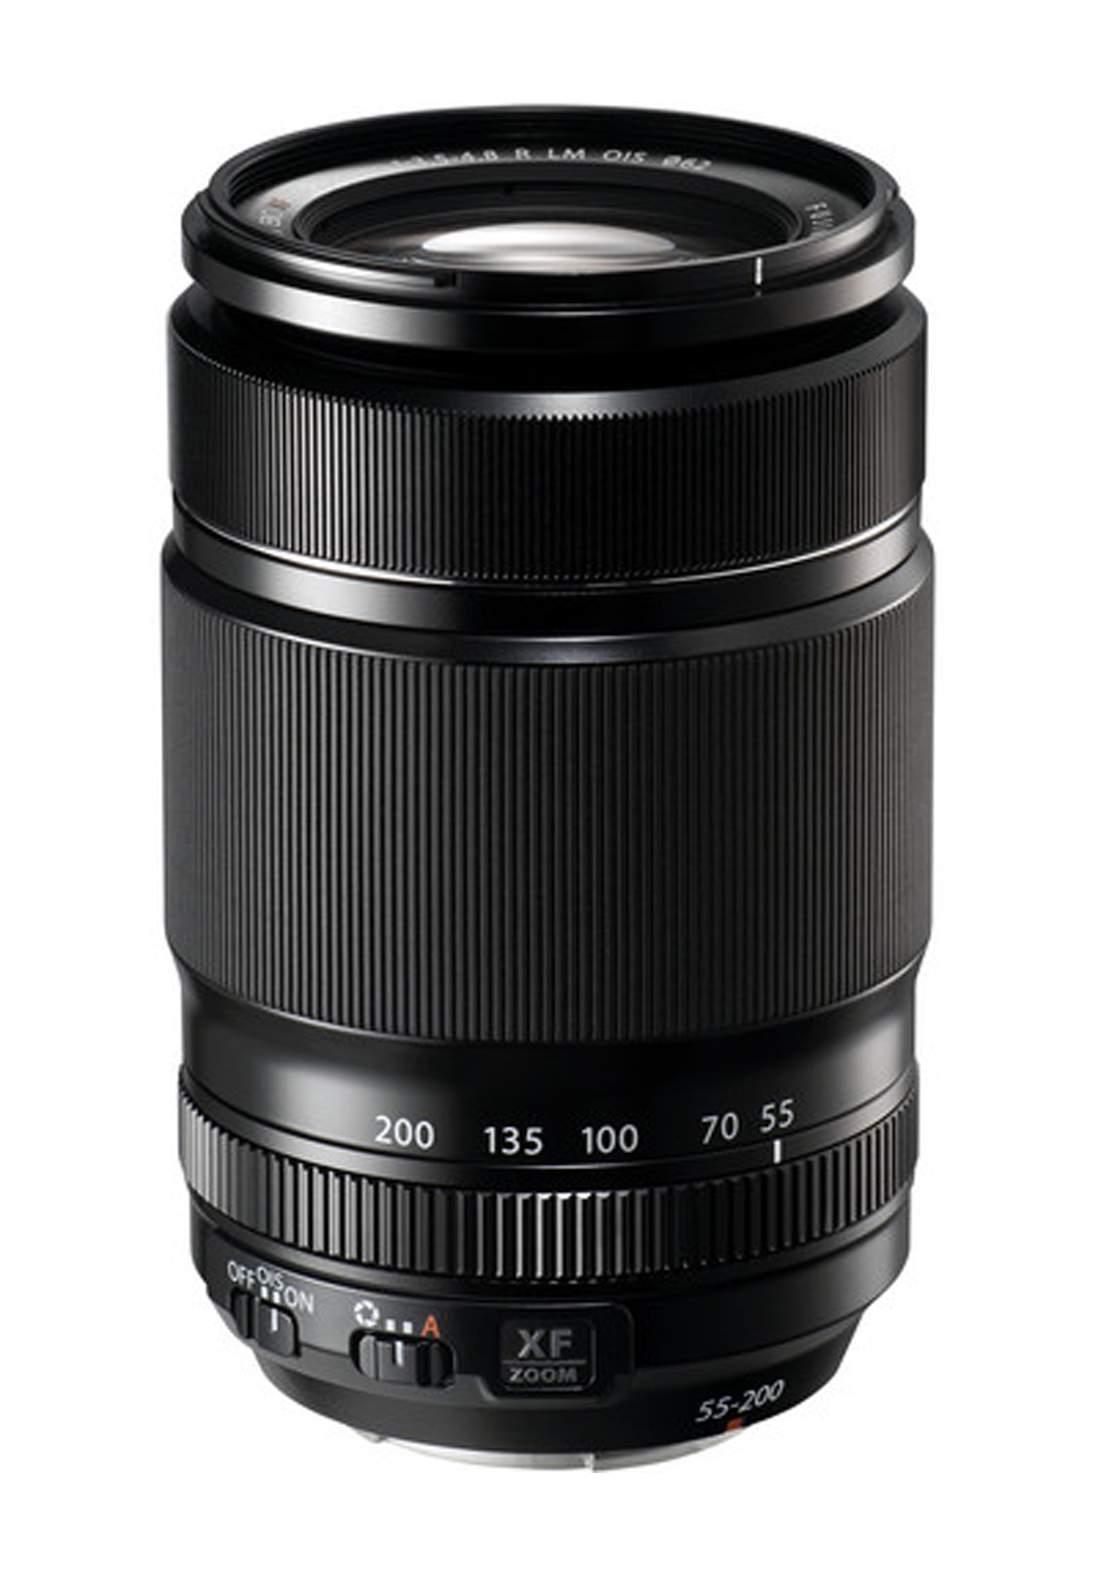 Fujifilm XF 55-200mm F3.5-4.8 R LM OIS Lens  - Black عدسة كاميرا